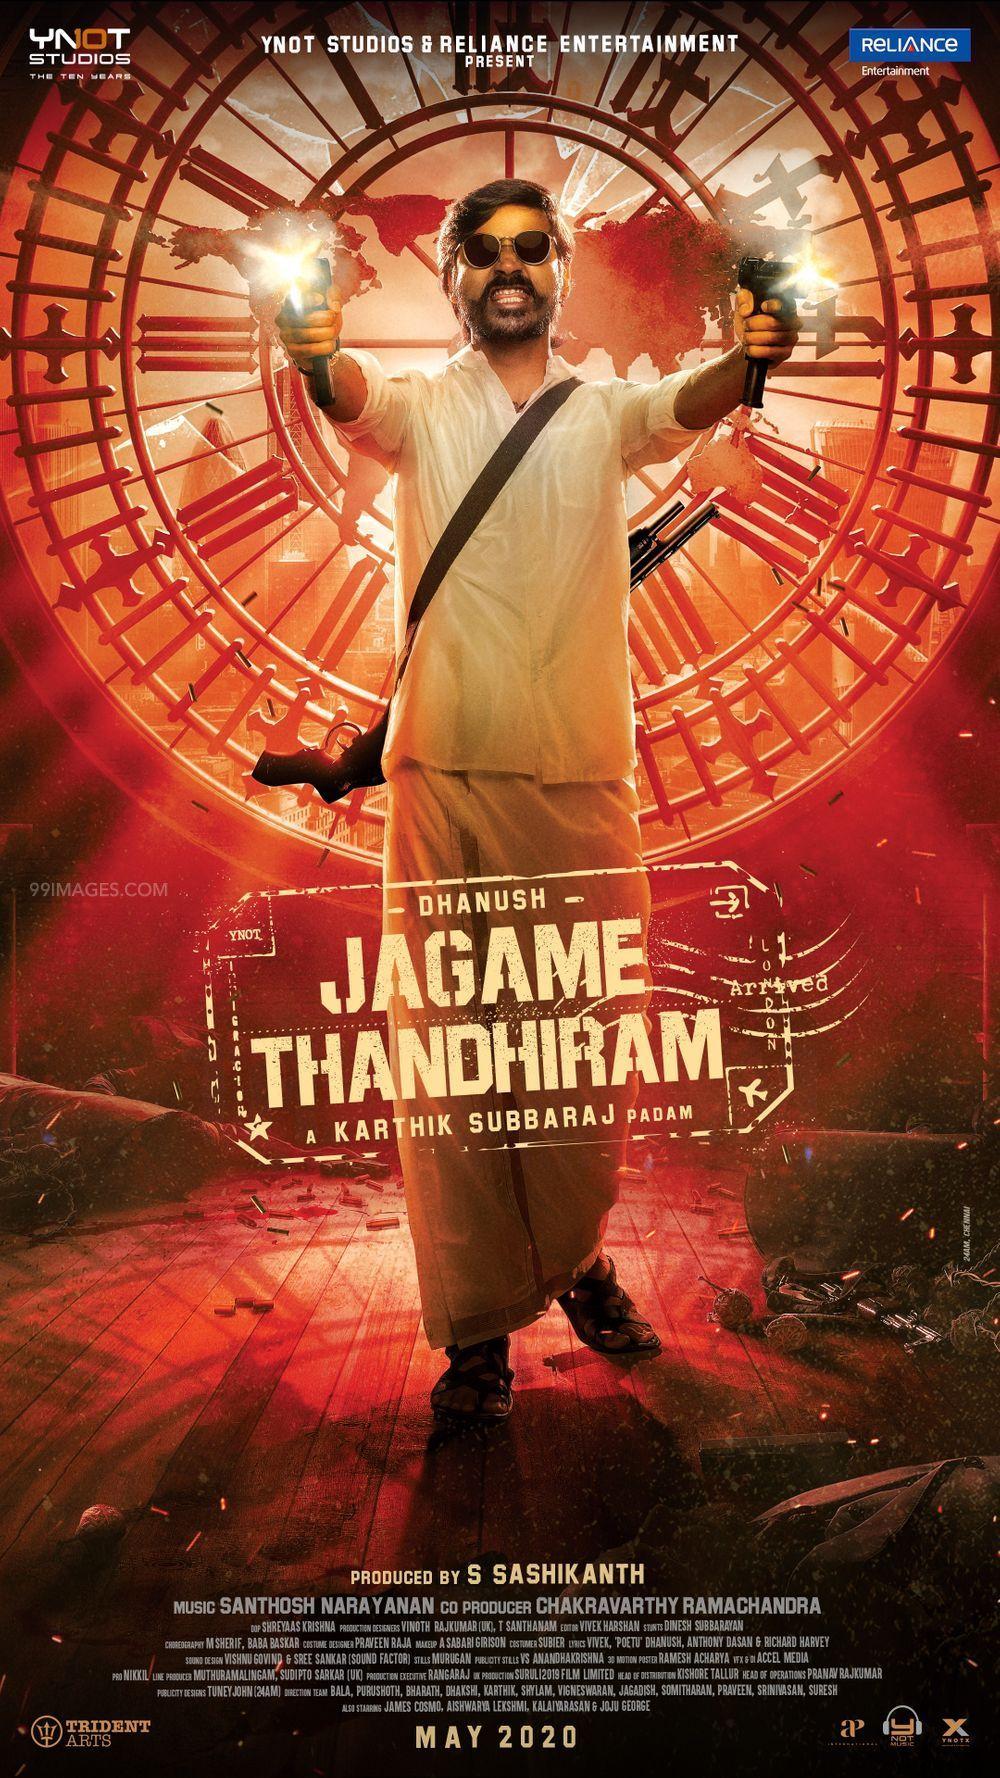 Jagame Thandhiram TamilRockers